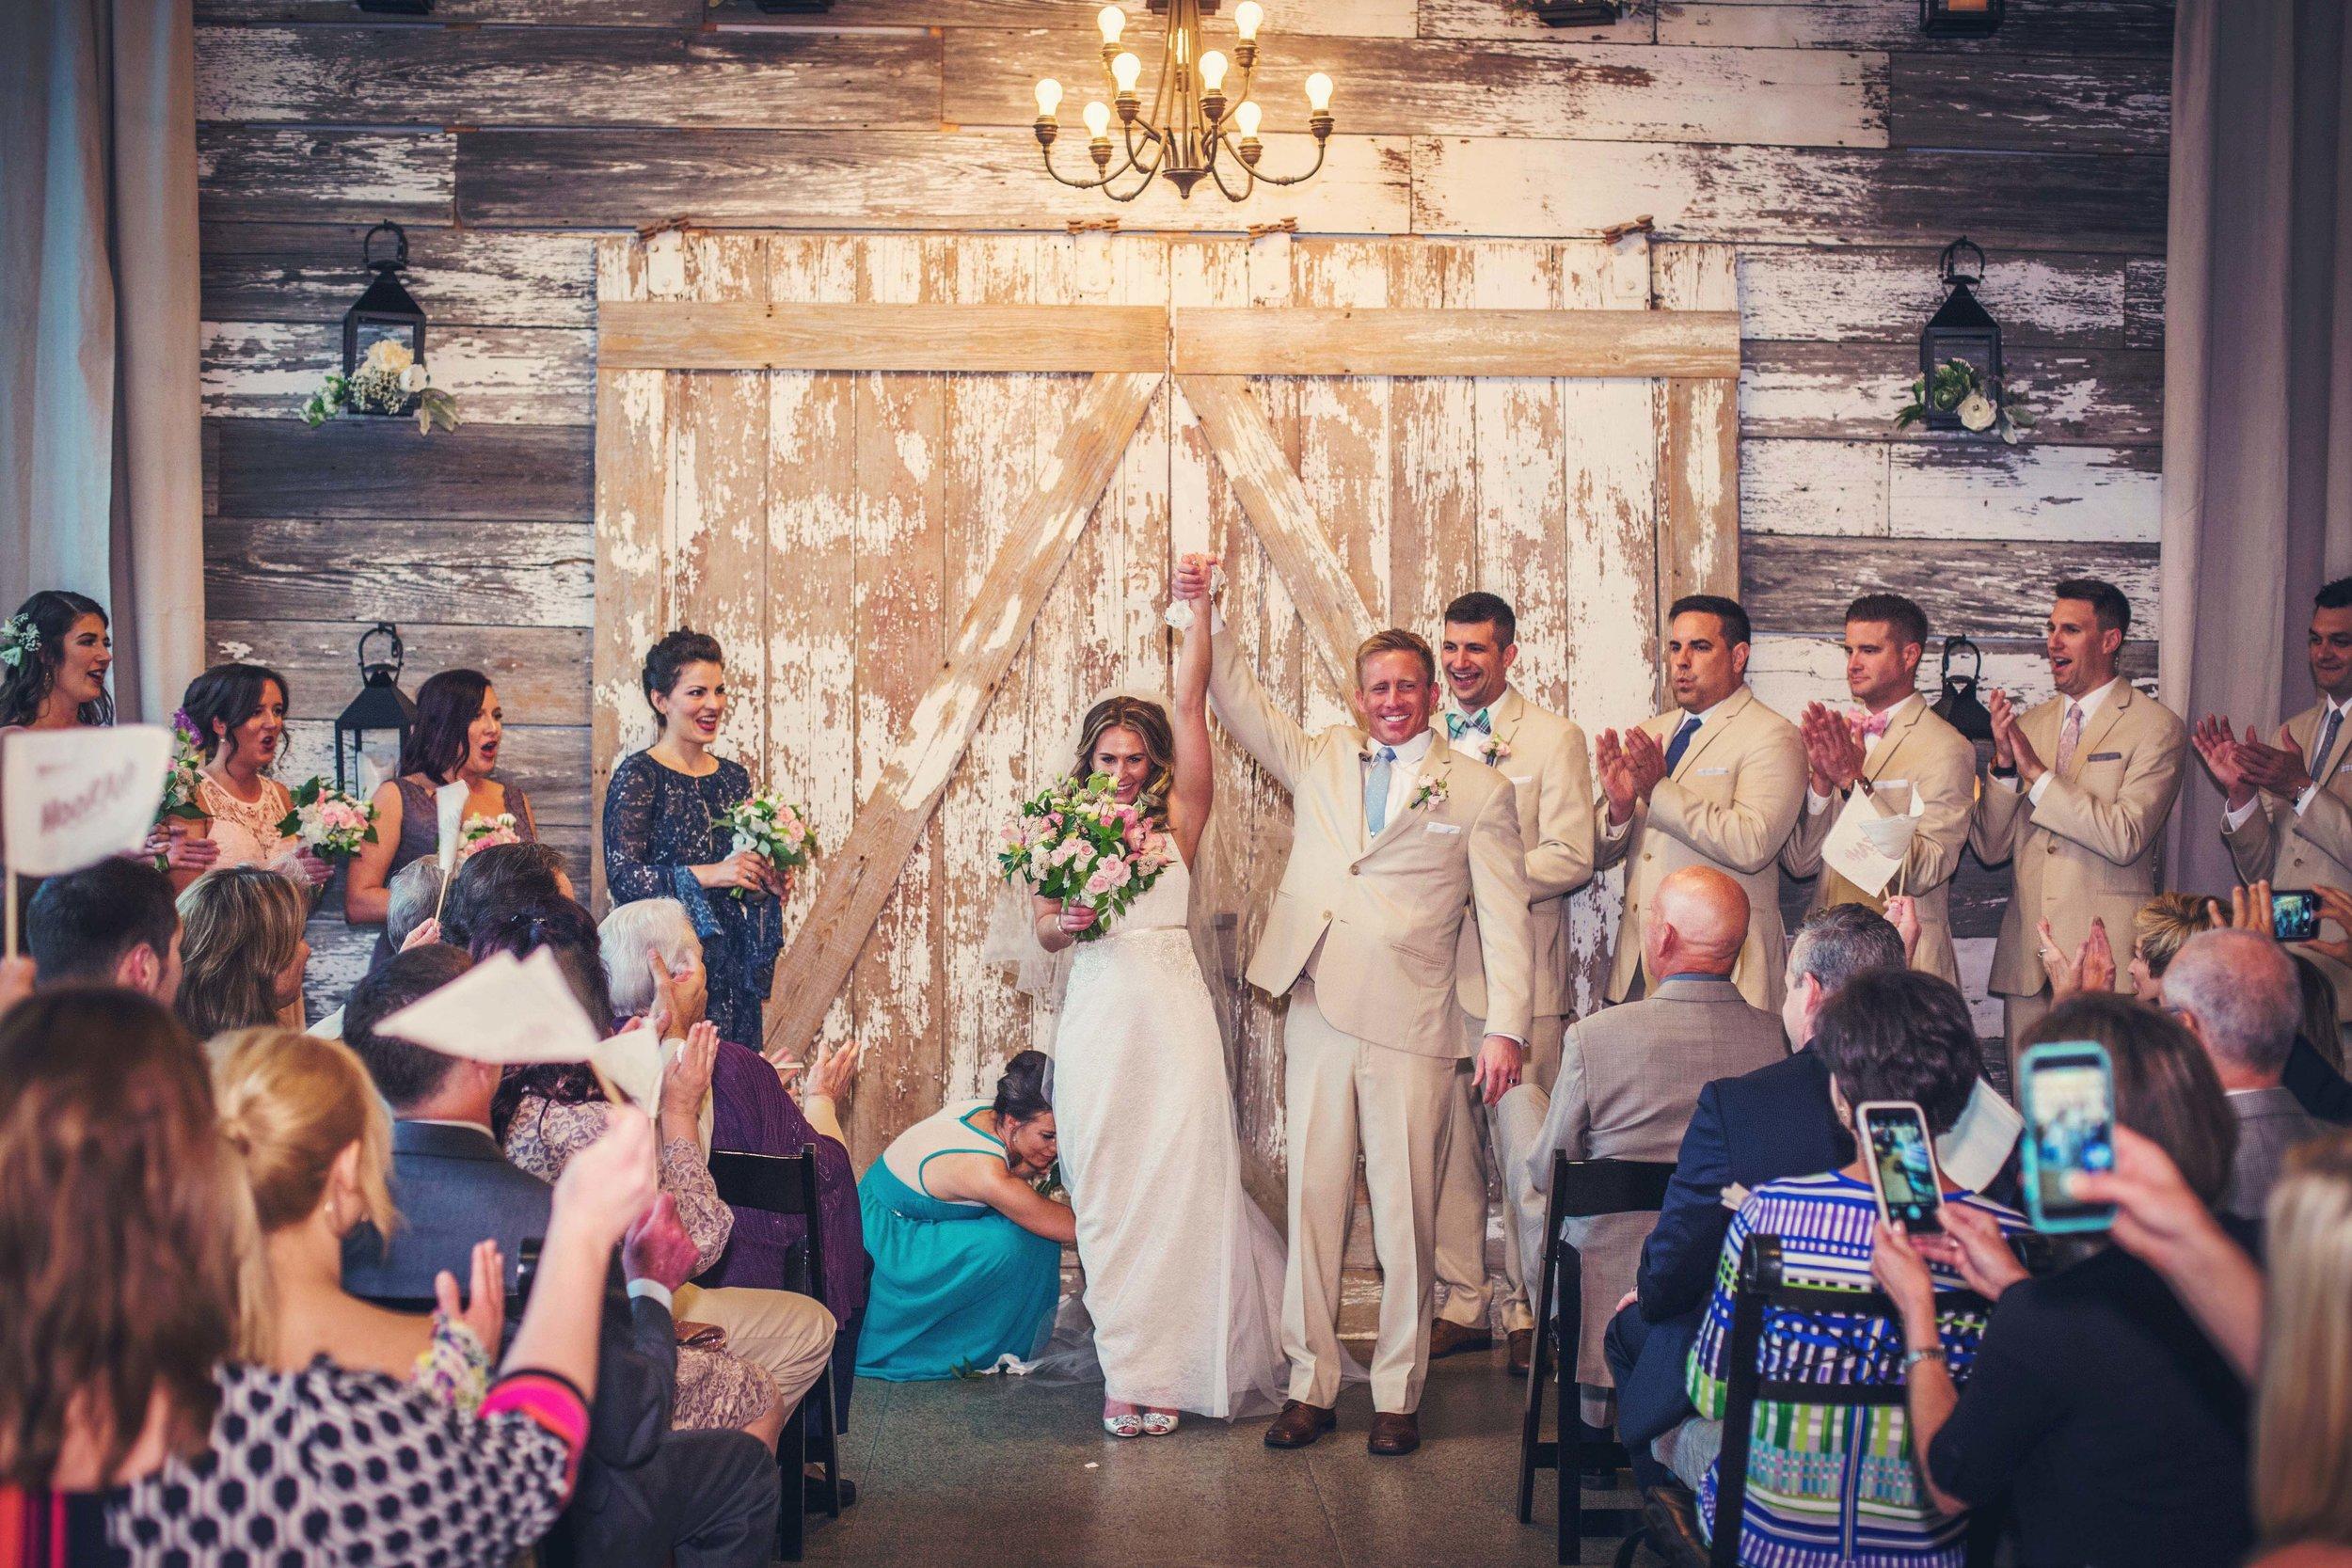 Kansas City-Small Wedding-Elope-Reception-Intimate-Ceremony-Megan & Jeff-120b.jpg